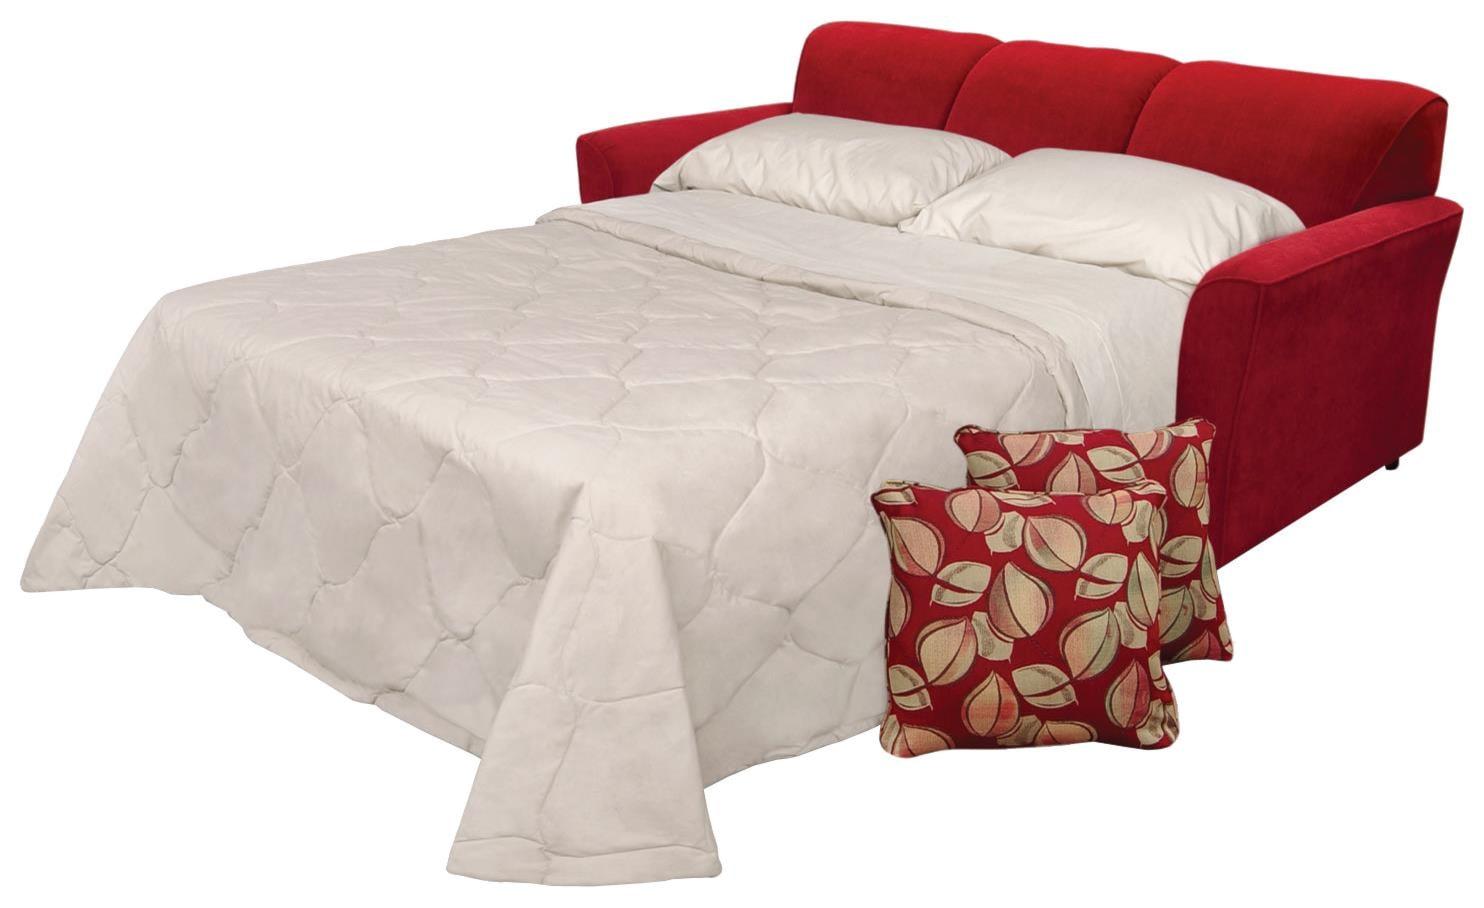 England Smyrna Queen Size Sleeper Sofa with Air Mattress  : smyrna2030020series20by20england309 b1jpgscalebothampwidth500ampheight500ampfsharpen25ampdown from www.dunkandbright.com size 500 x 500 jpeg 26kB